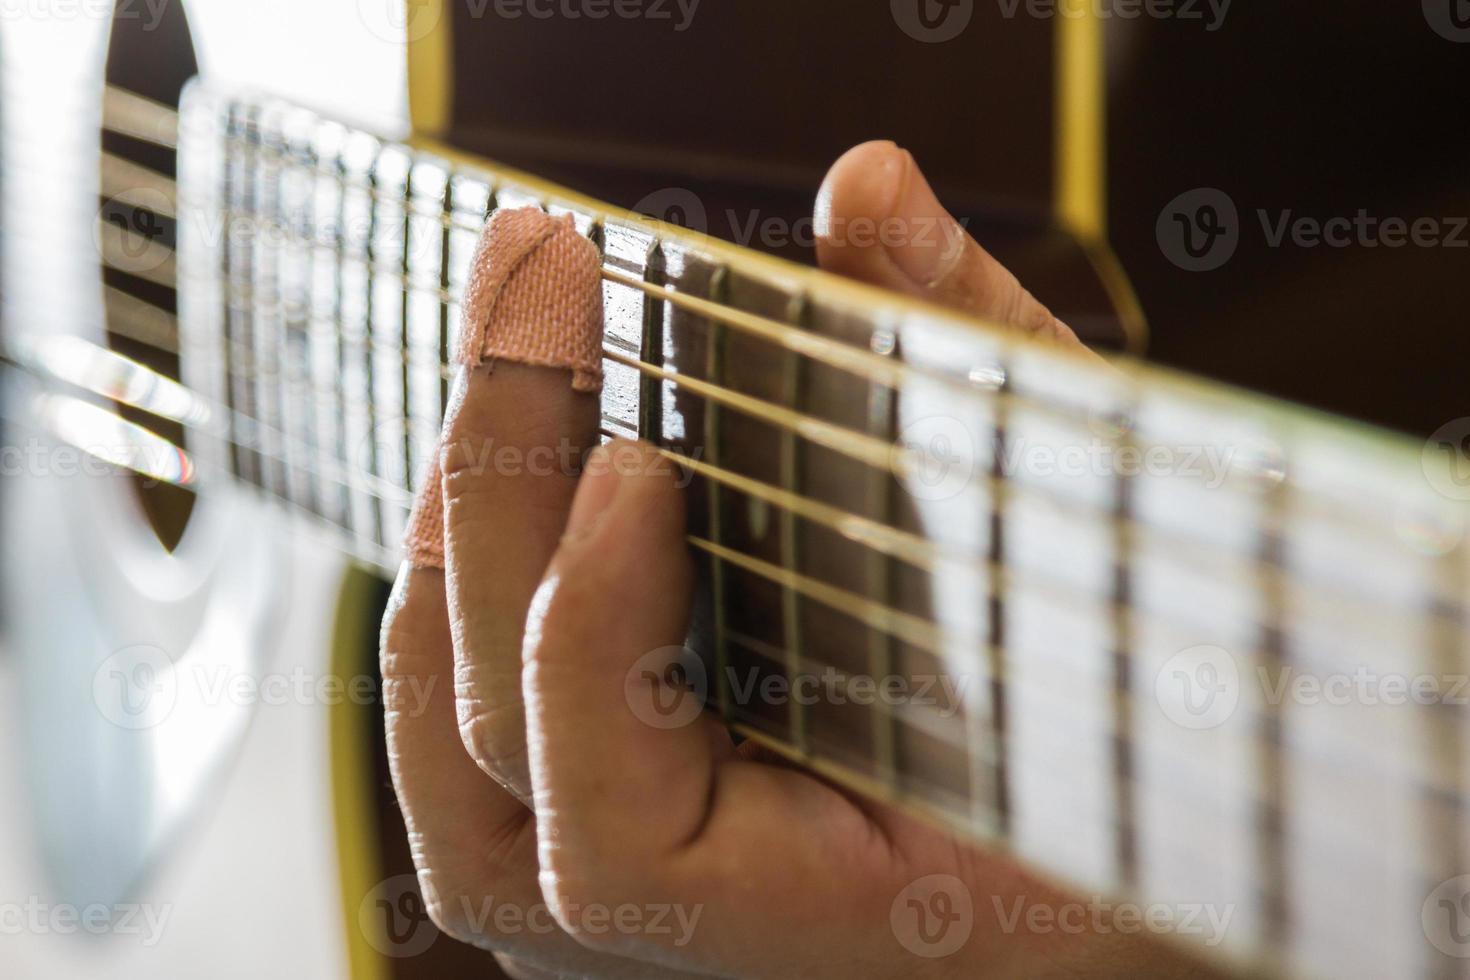 Guitar effort photo